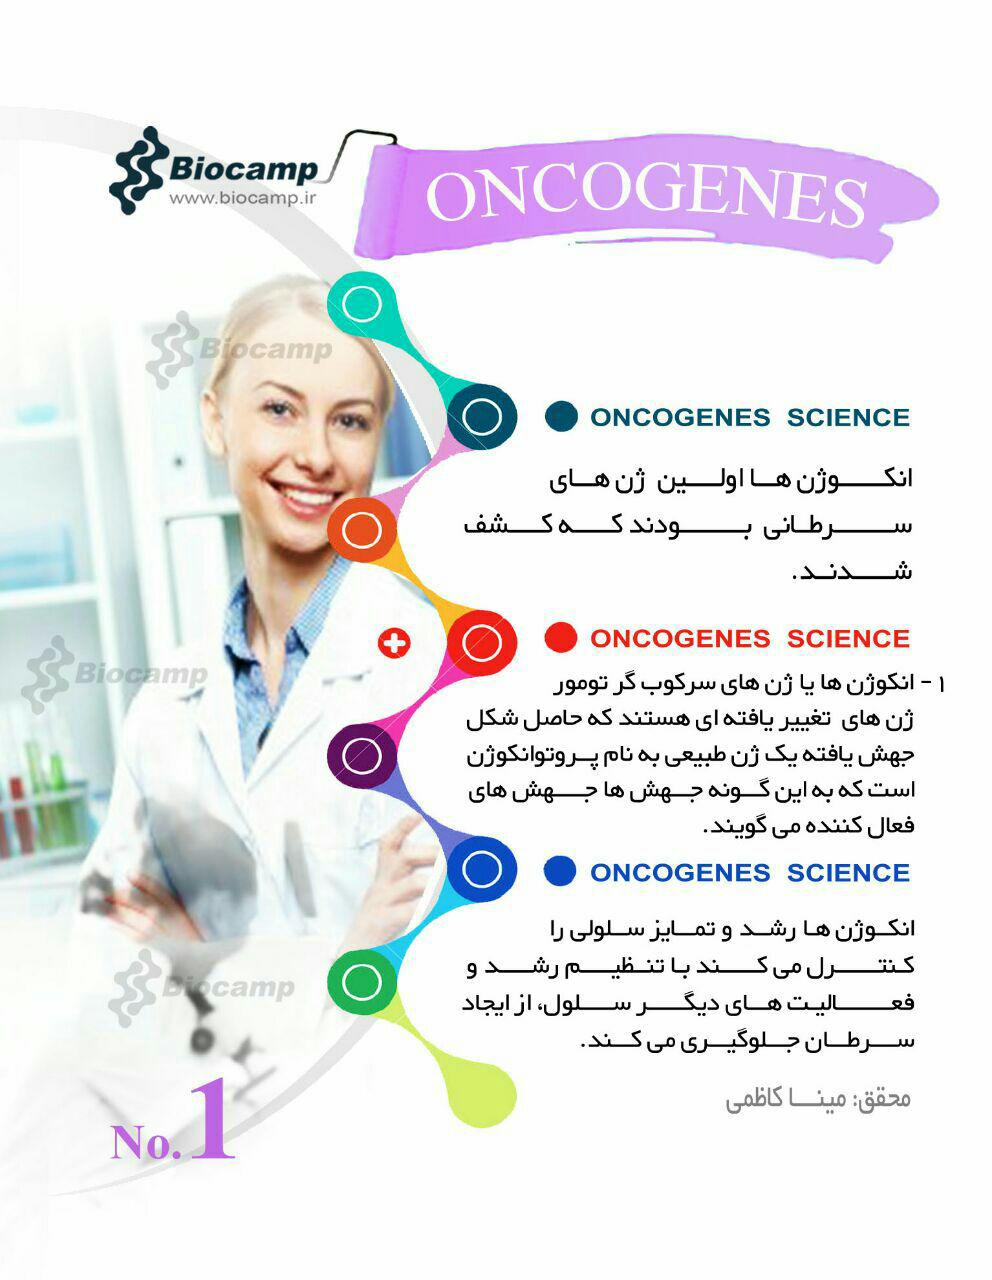 انکوژن انکوژن چیست؟ اینفوگرافی انکوژن چیست؟ اینفوگرافی photo 2016 09 12 21 16 09